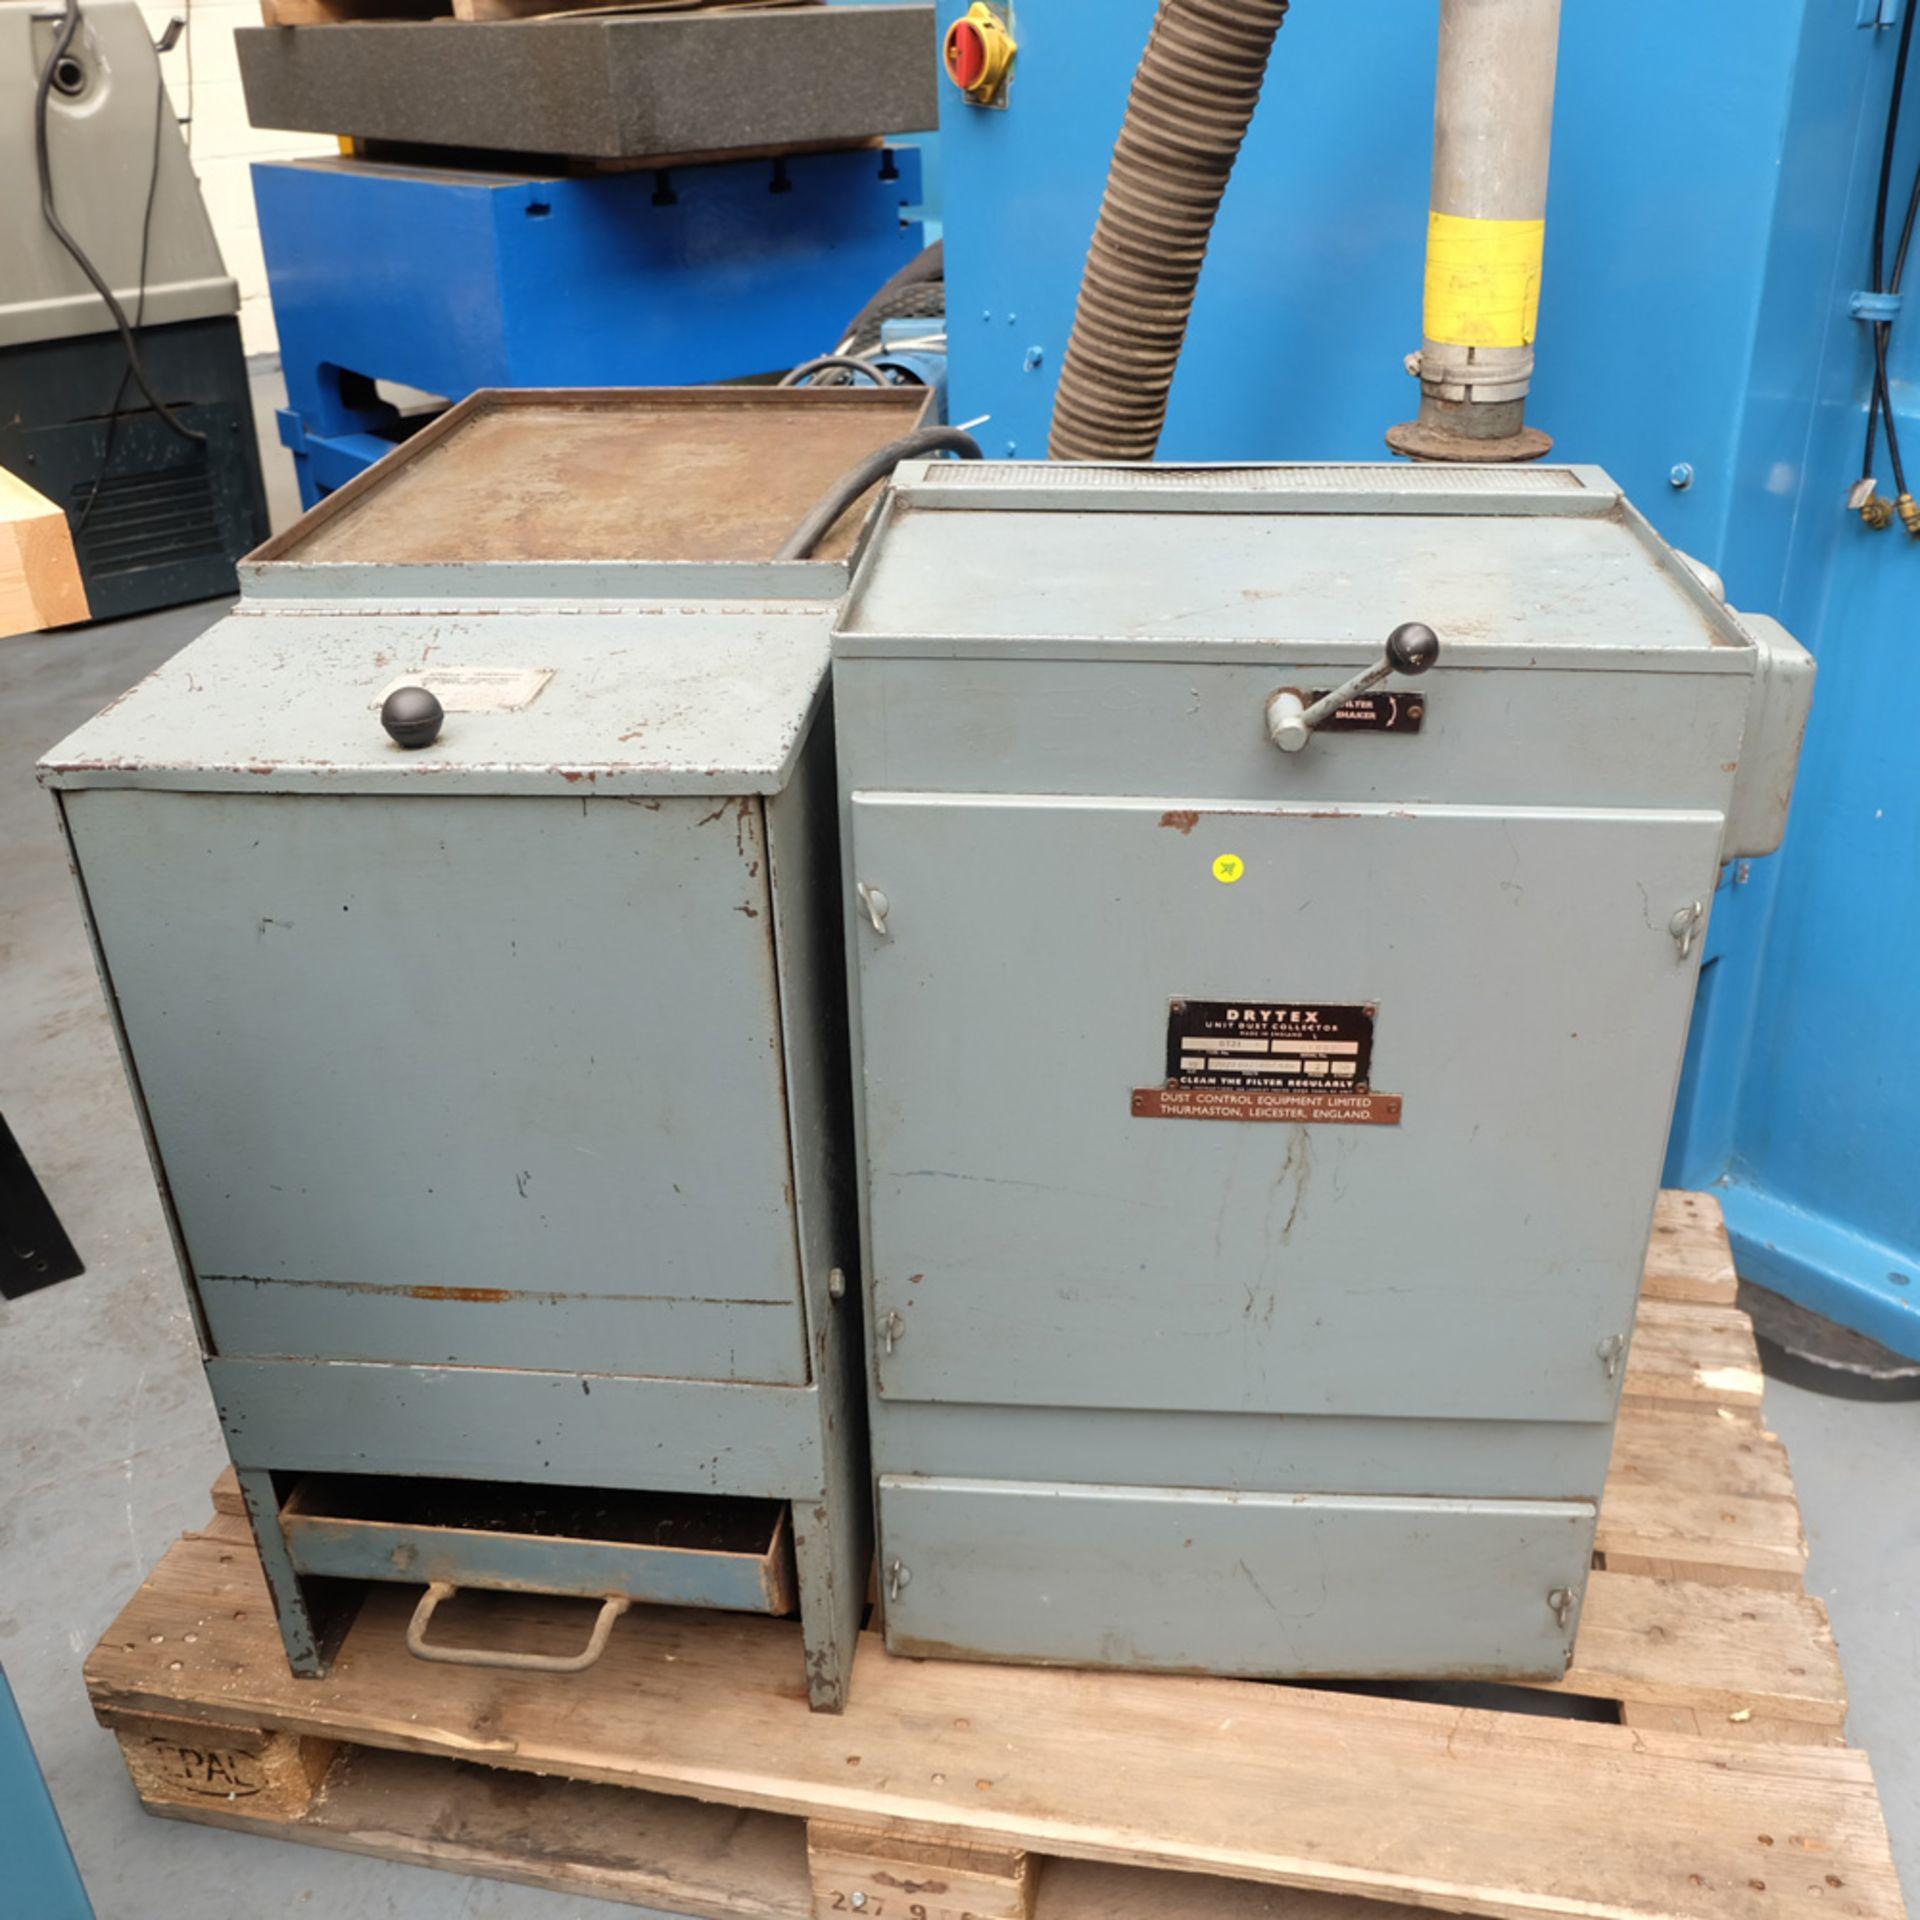 Jones & Shipman 1400P Toolroom Surface Grinder. - Image 10 of 10